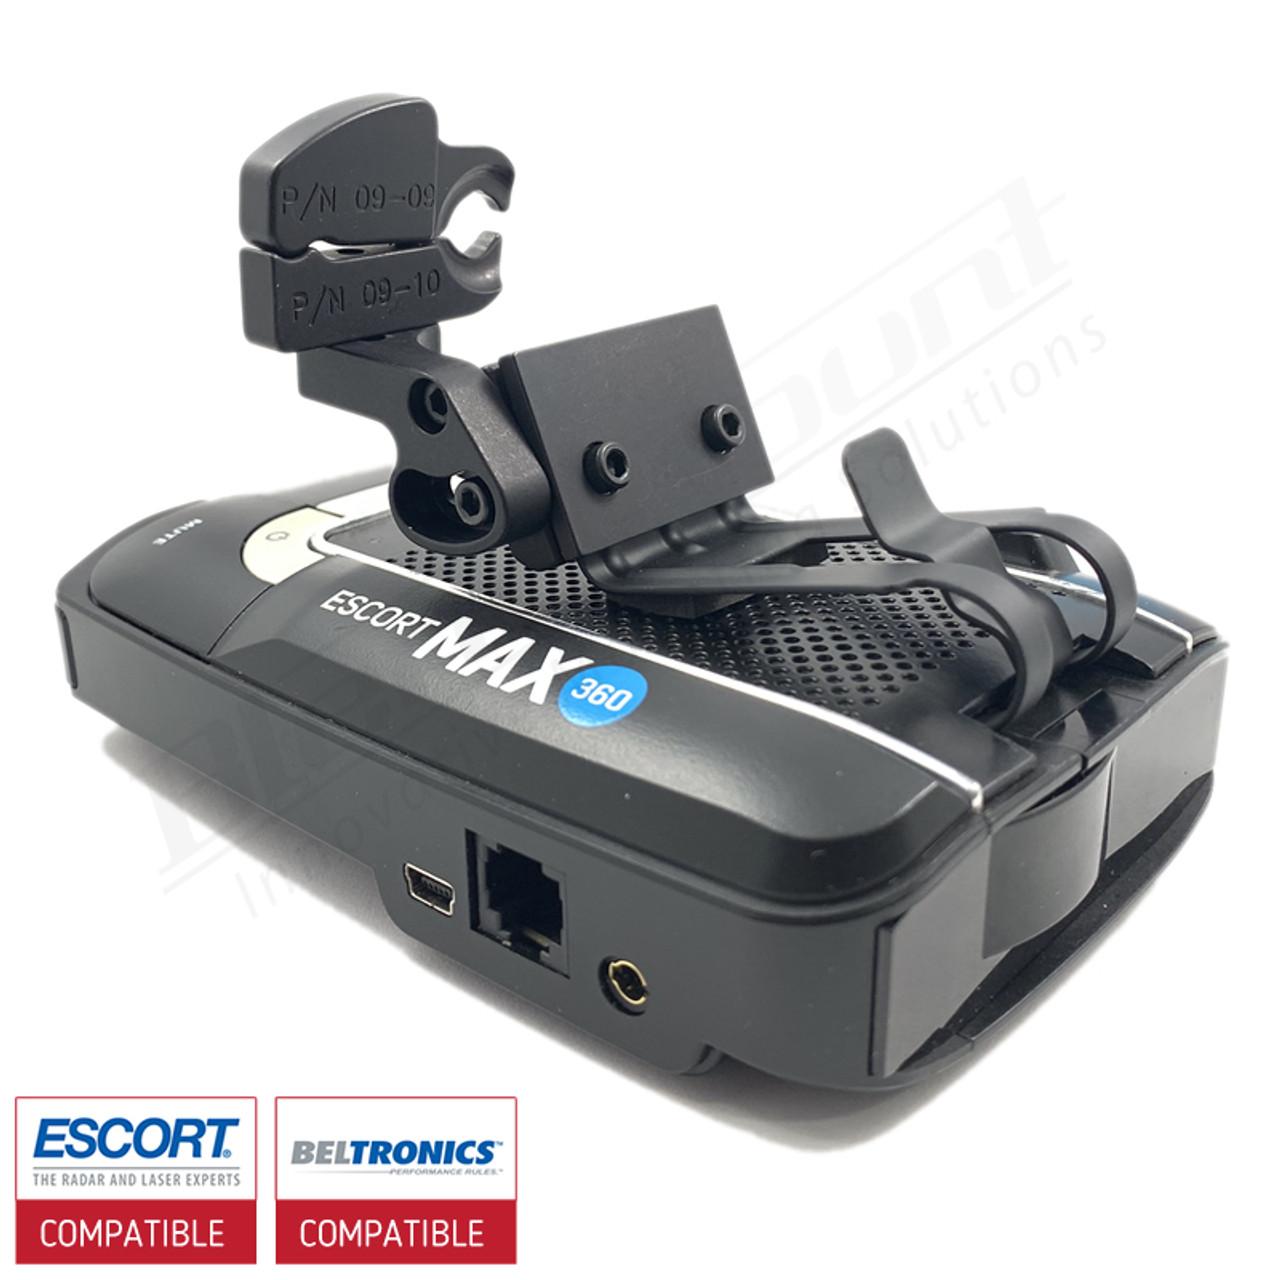 Escort Max//Max360 Blendmount Radar Detector Mounting System C7 Corvette 2014